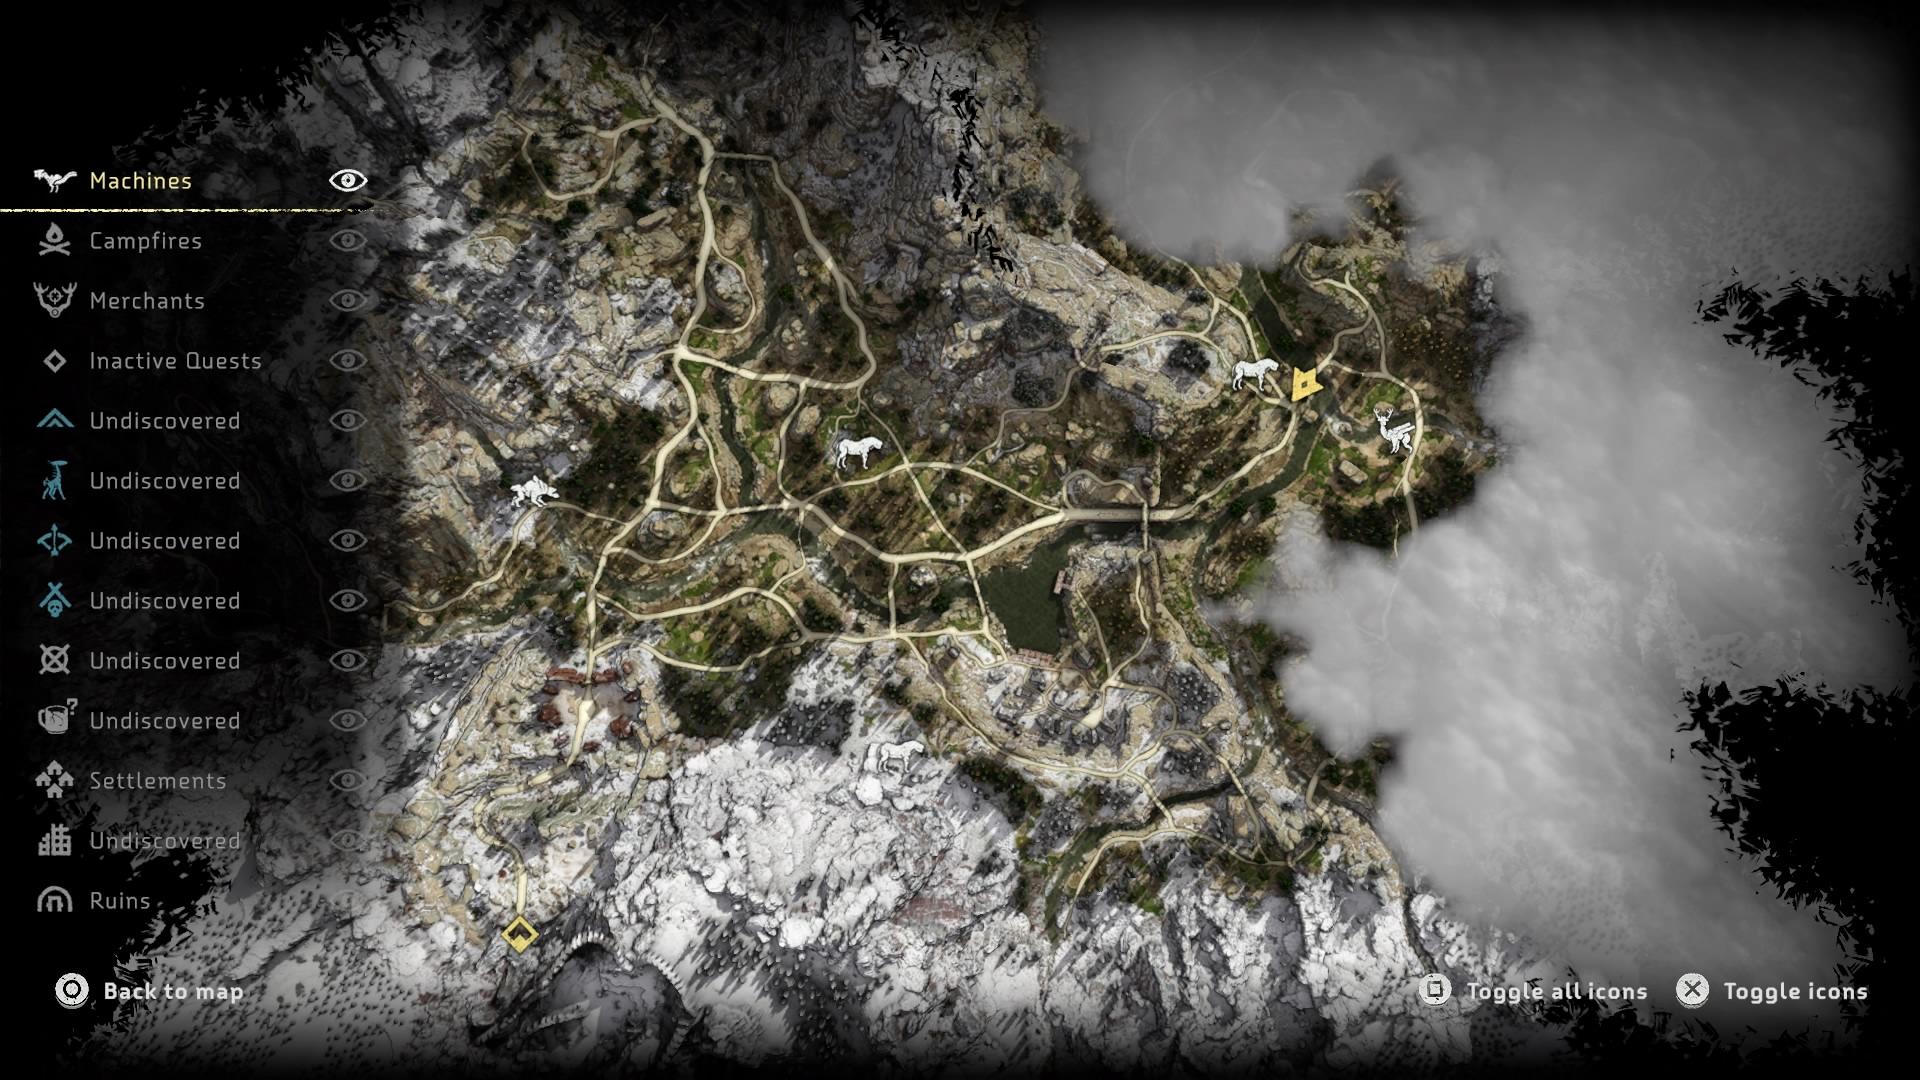 Nové možnosti ve fotografickém režimu Horizon: Zero Dawn 143385